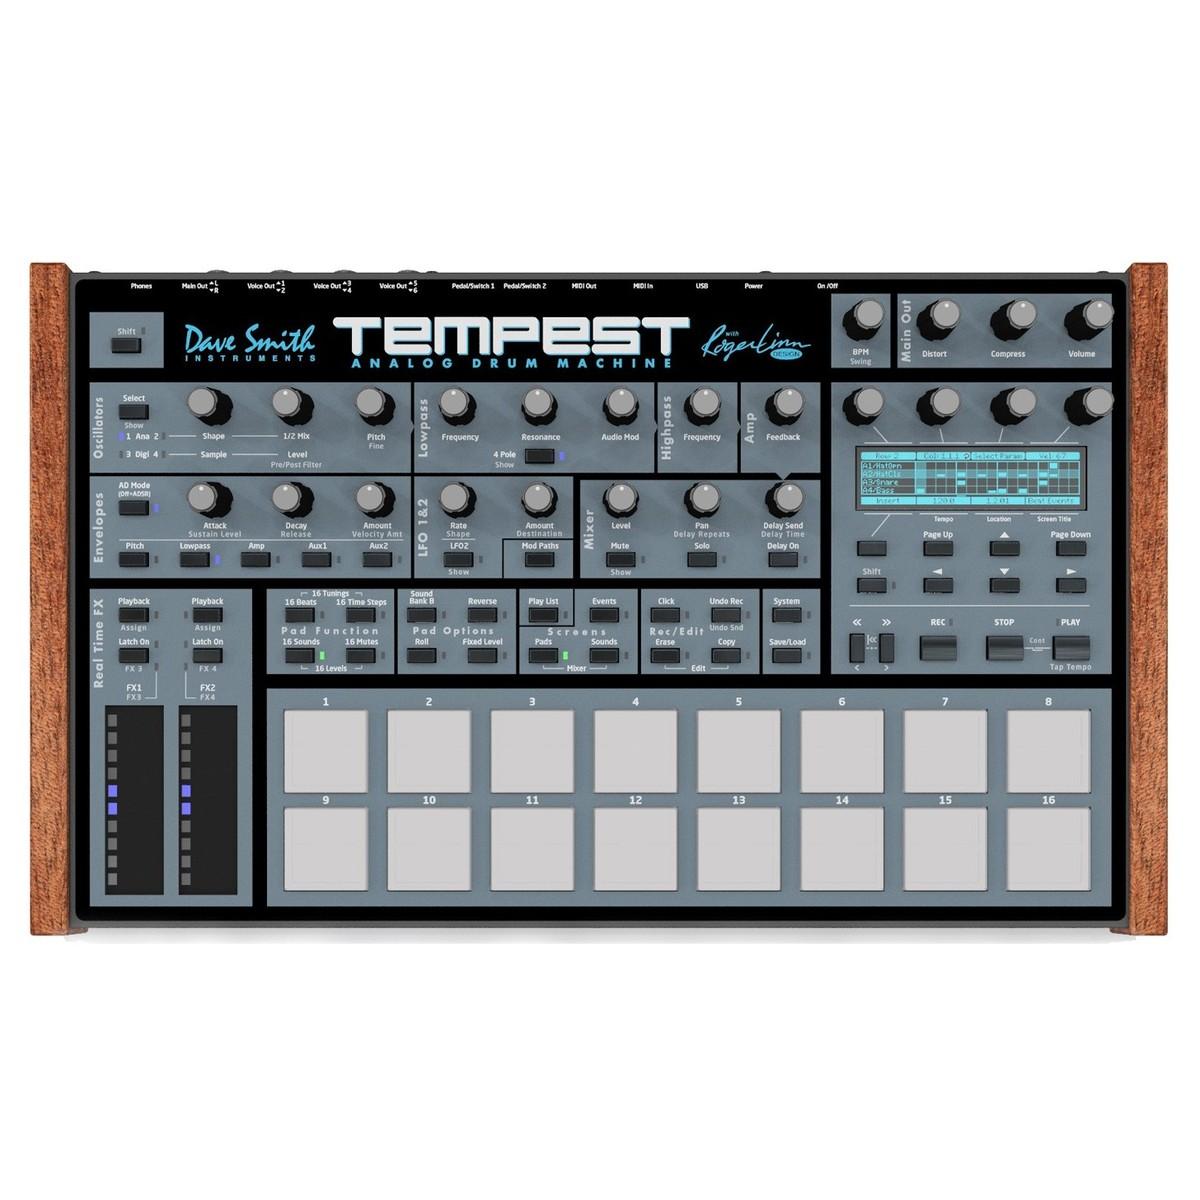 Dave Smith Instruments Tempest Analog Drum Machine At